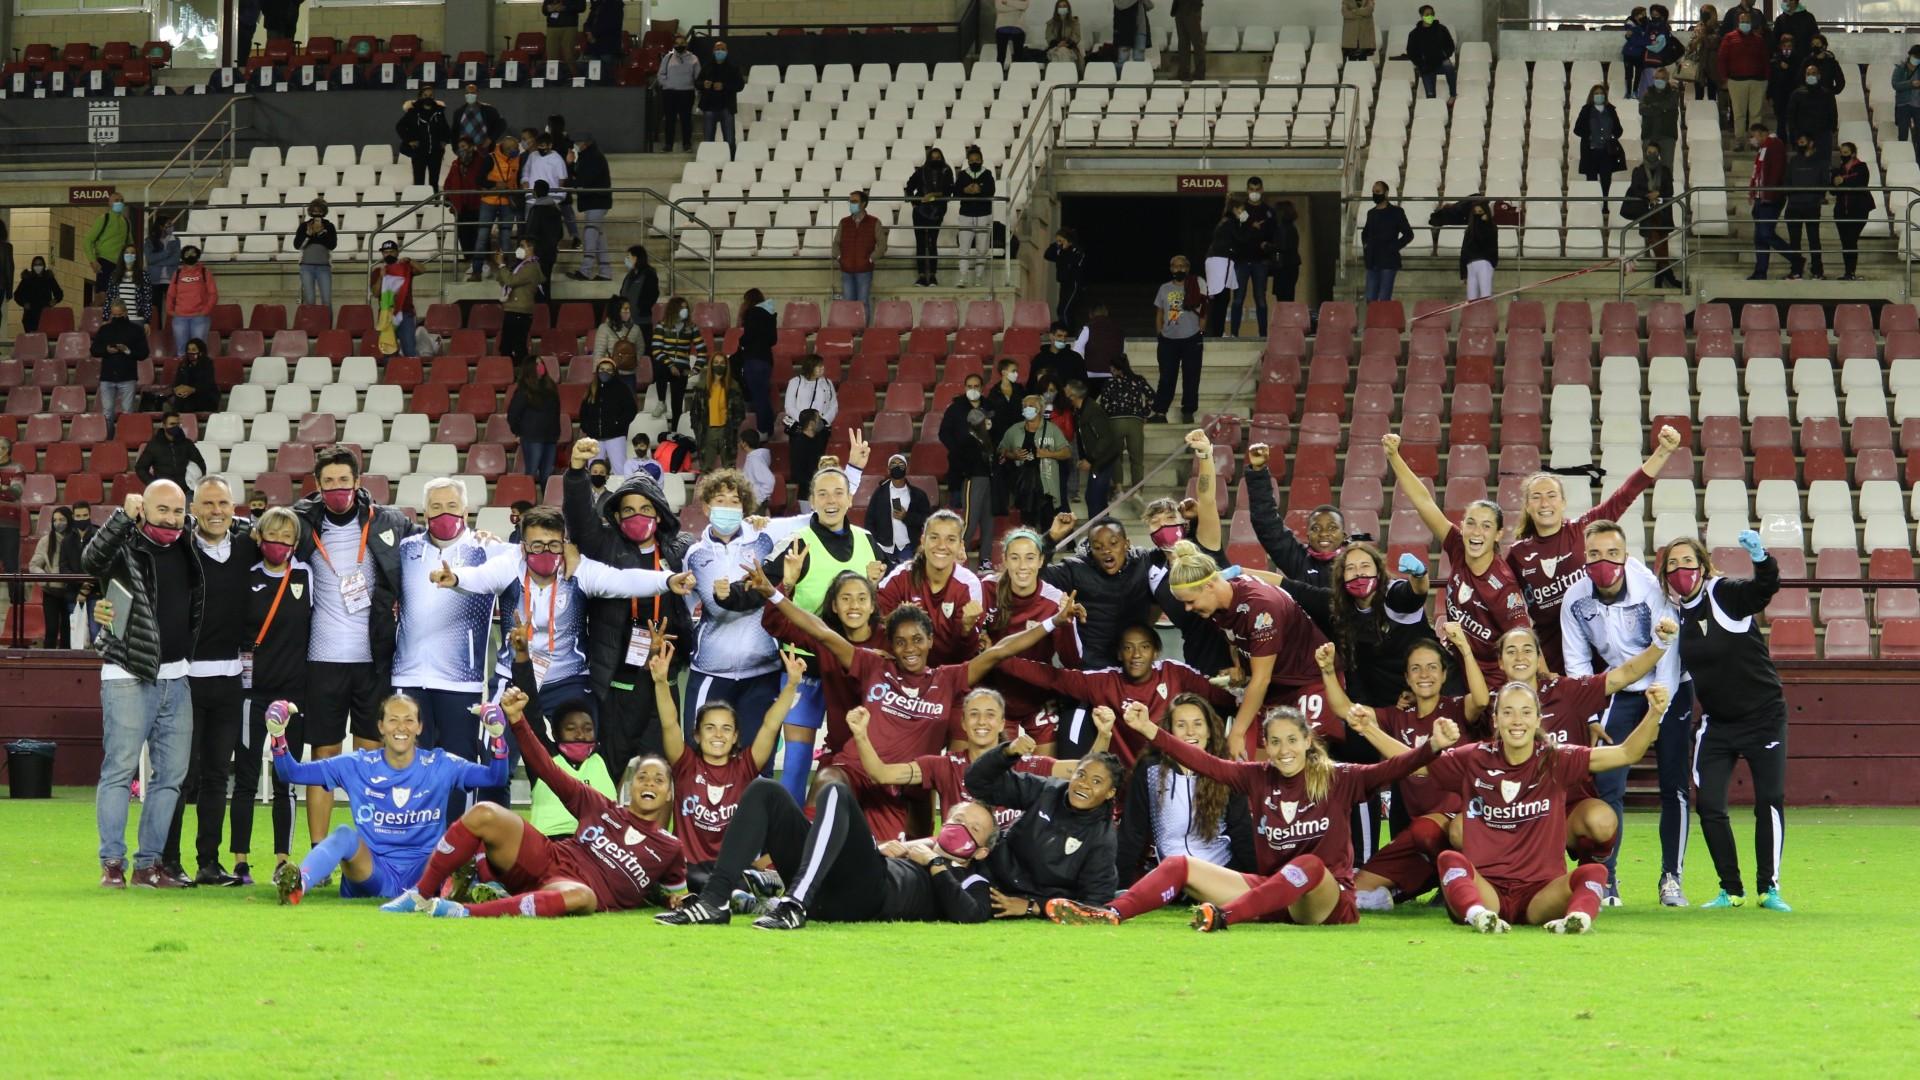 Asantewaa, Guehai, Elloh & Boho help Logrono to Spanish Copa de la Reina final